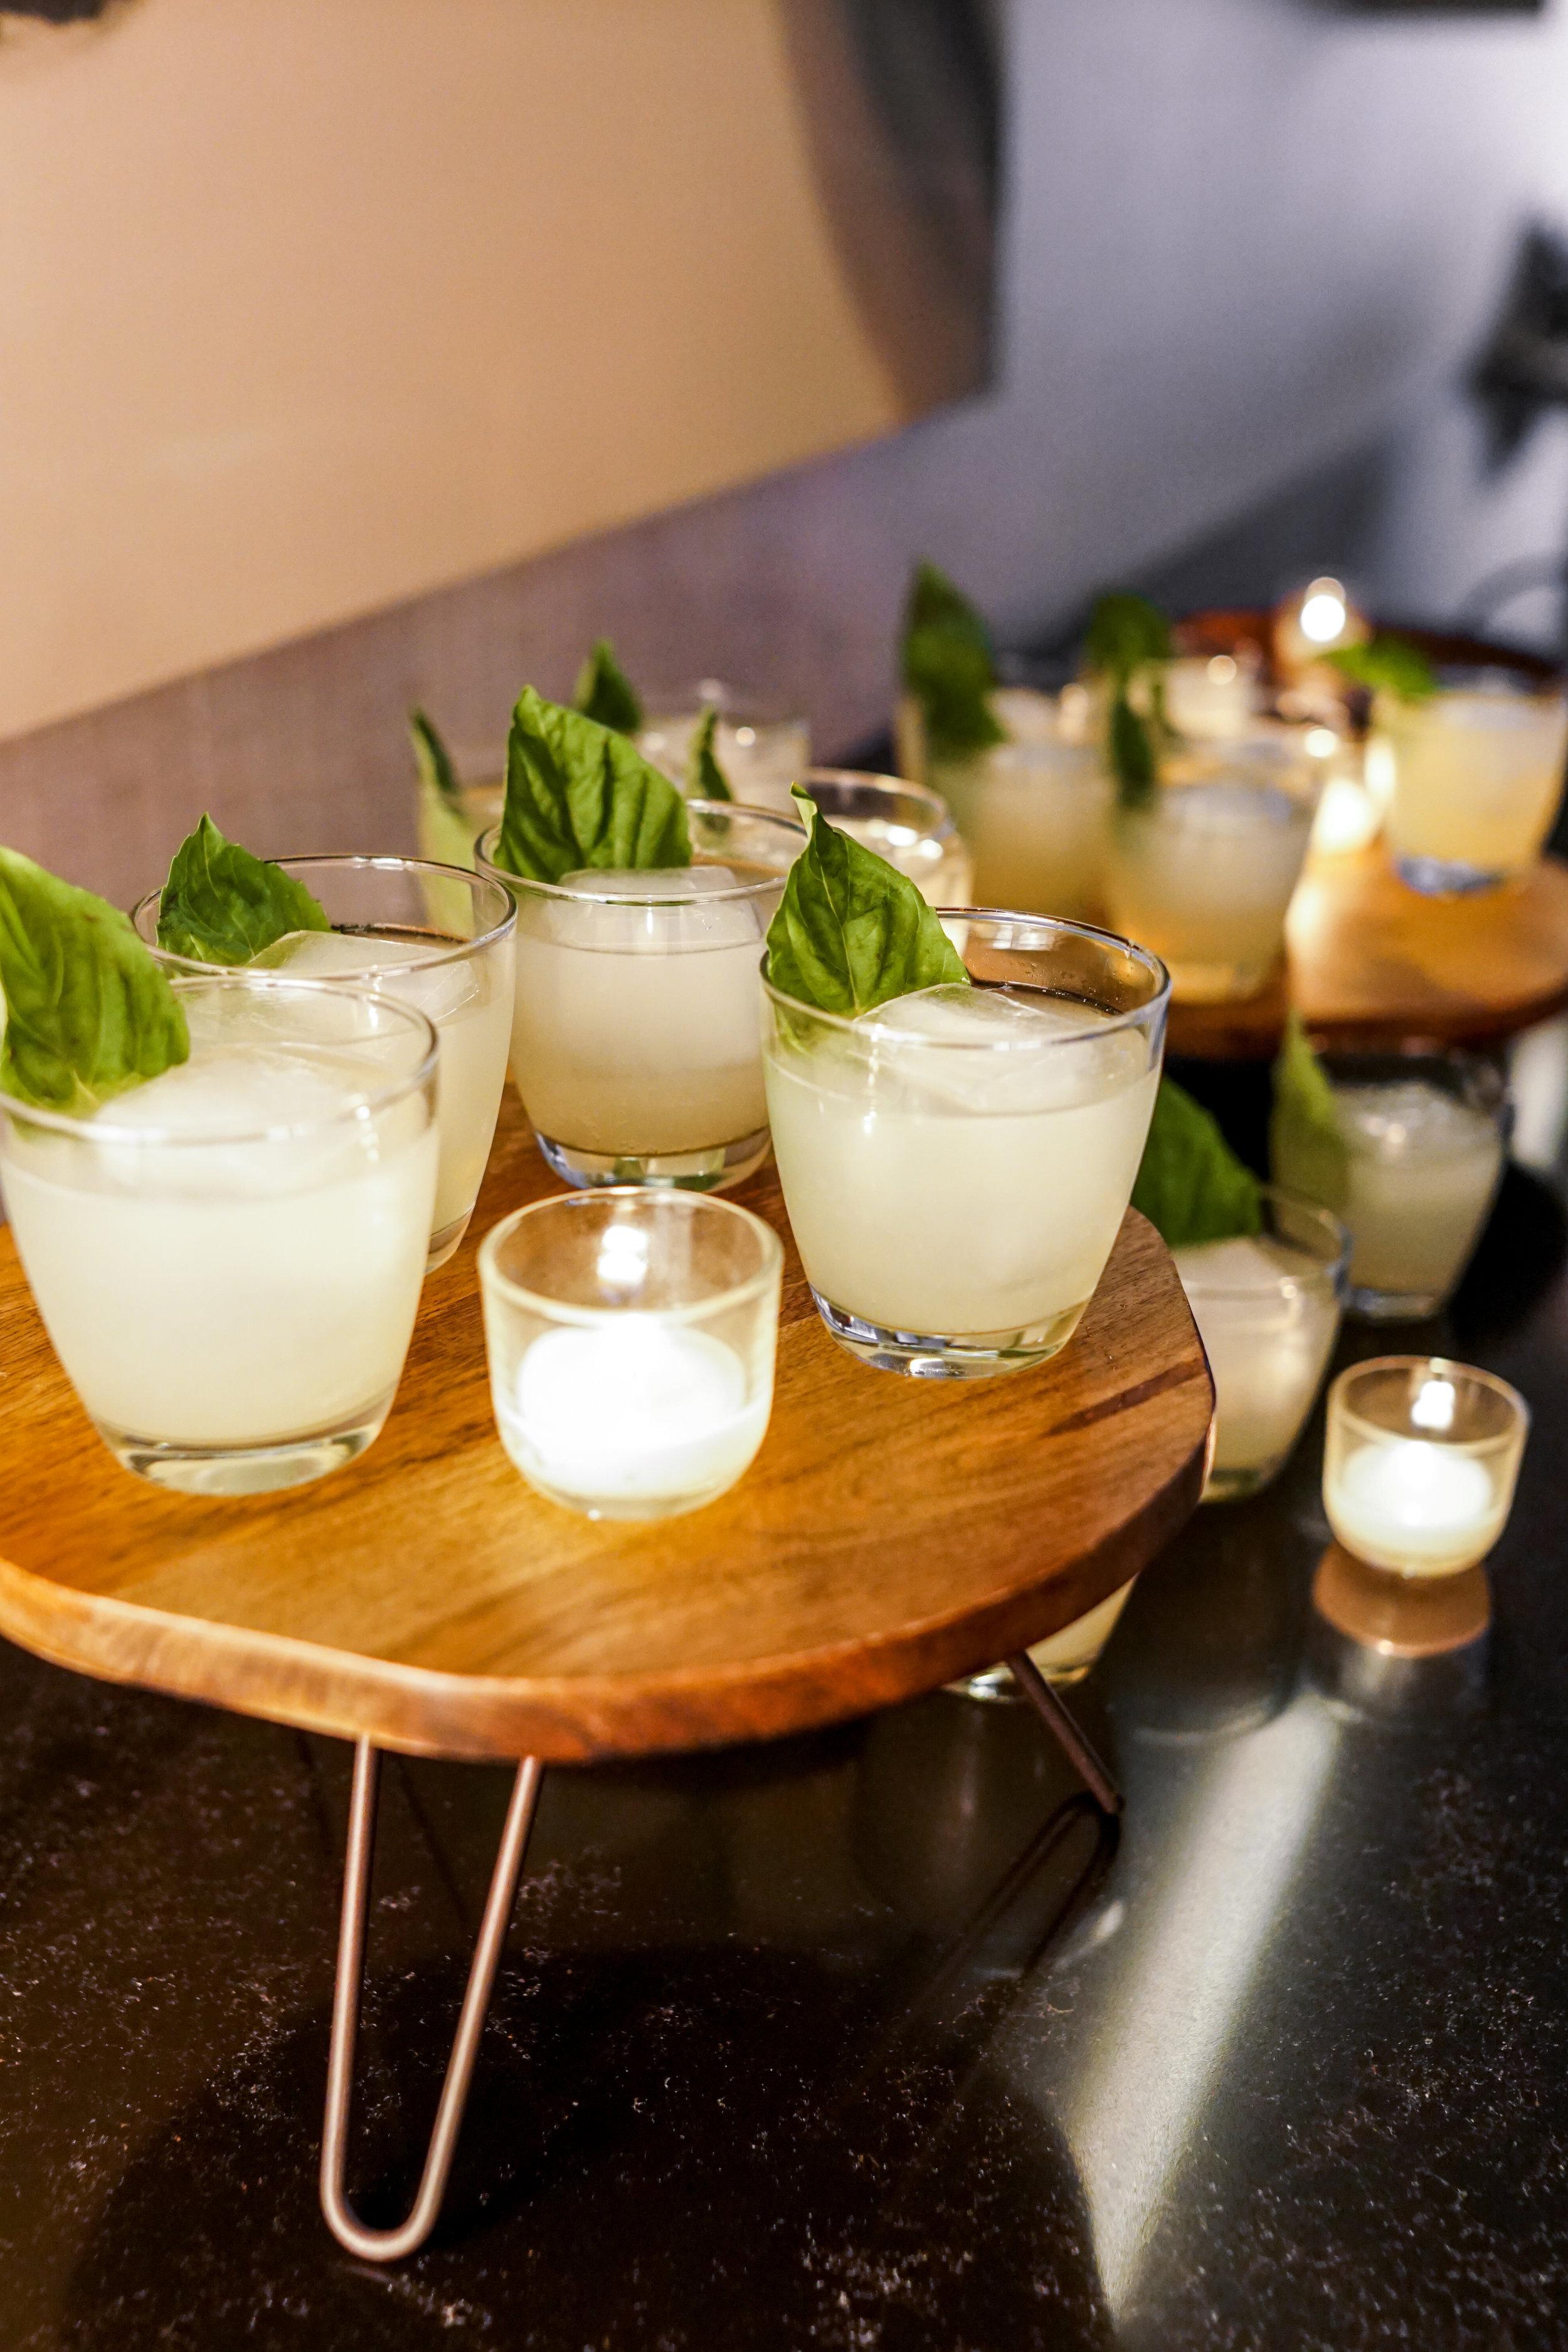 wedding cocktails with basil garnish